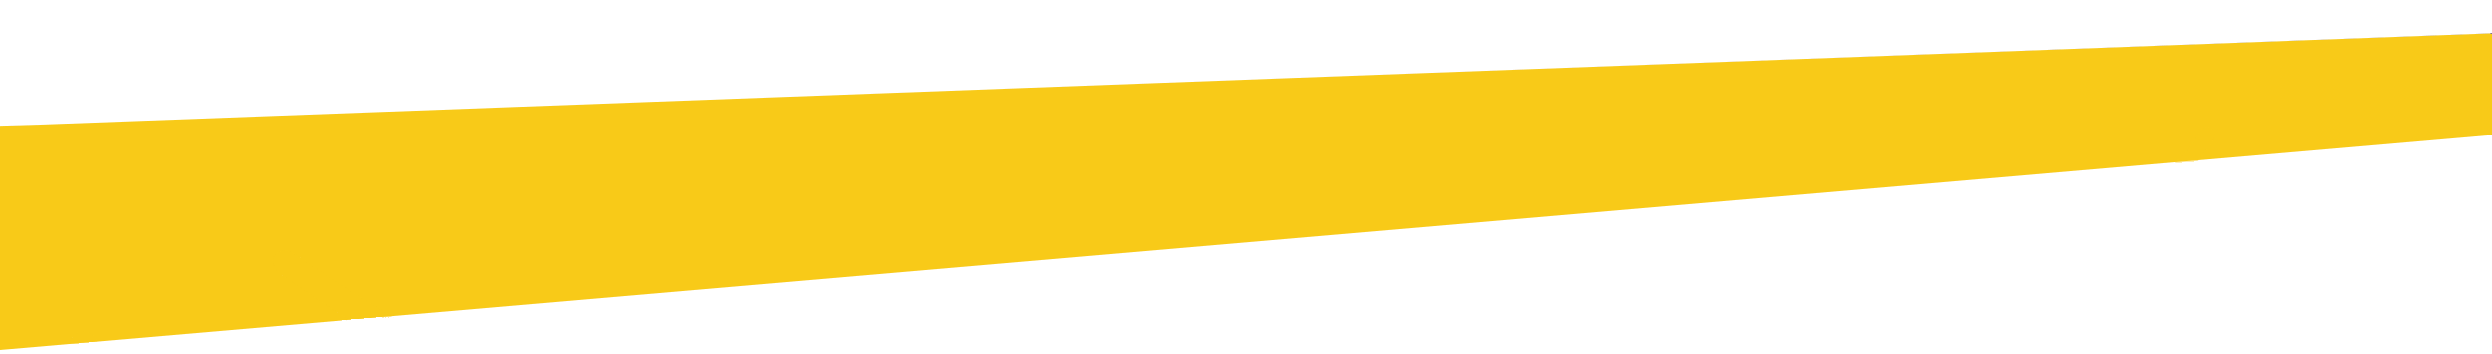 bande jaune diagonale